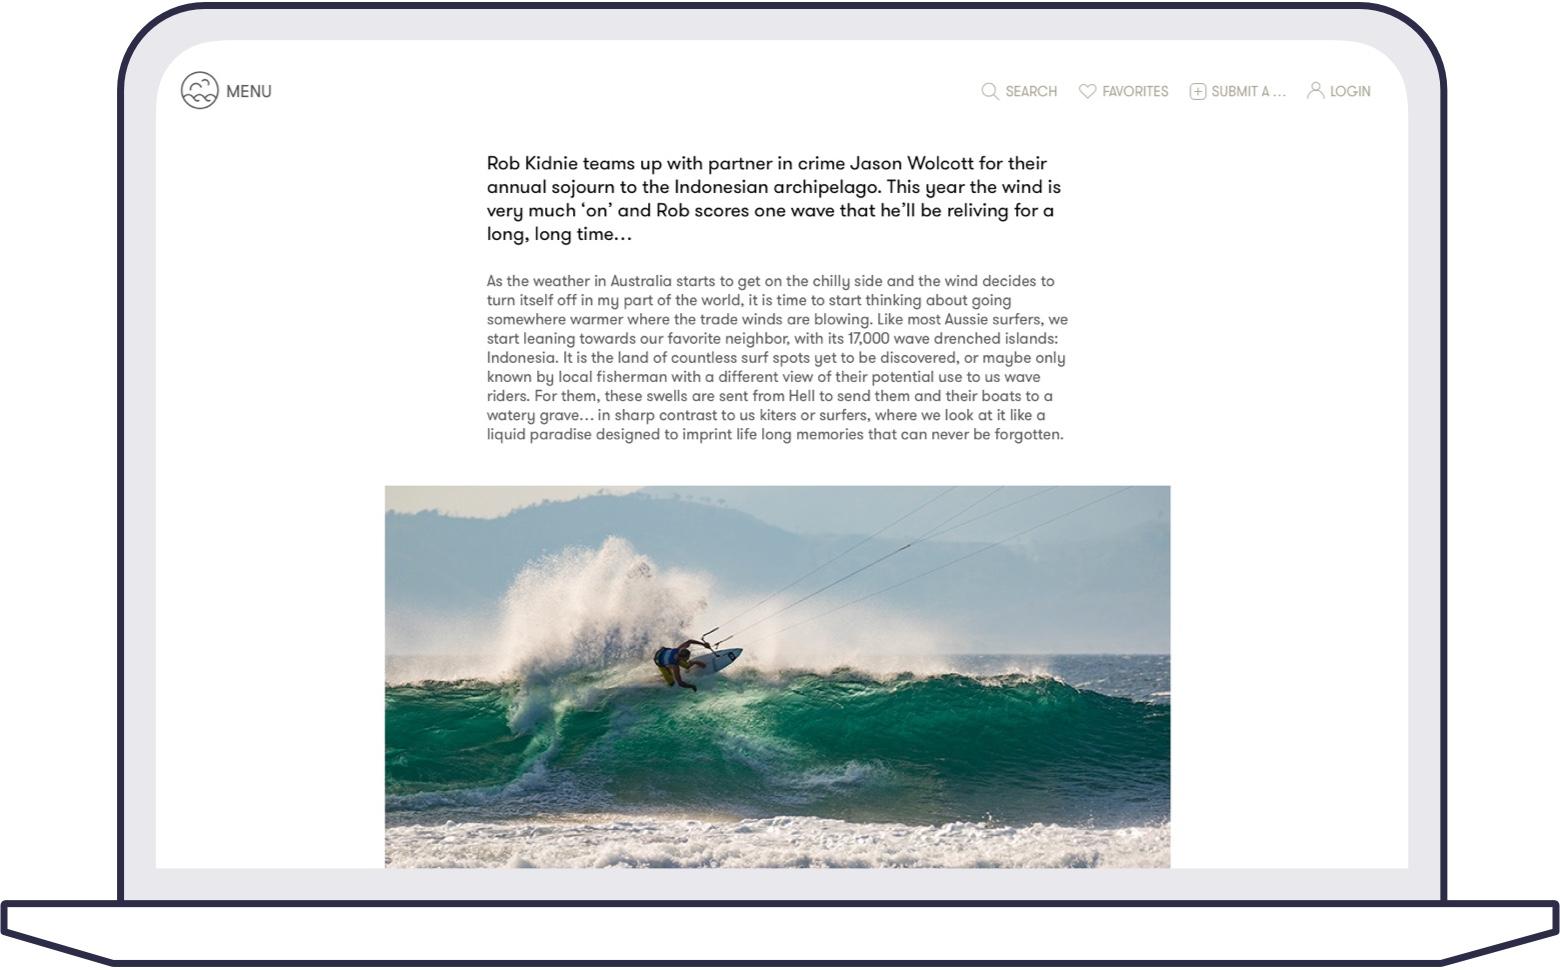 Screenshot of kitesurfin article